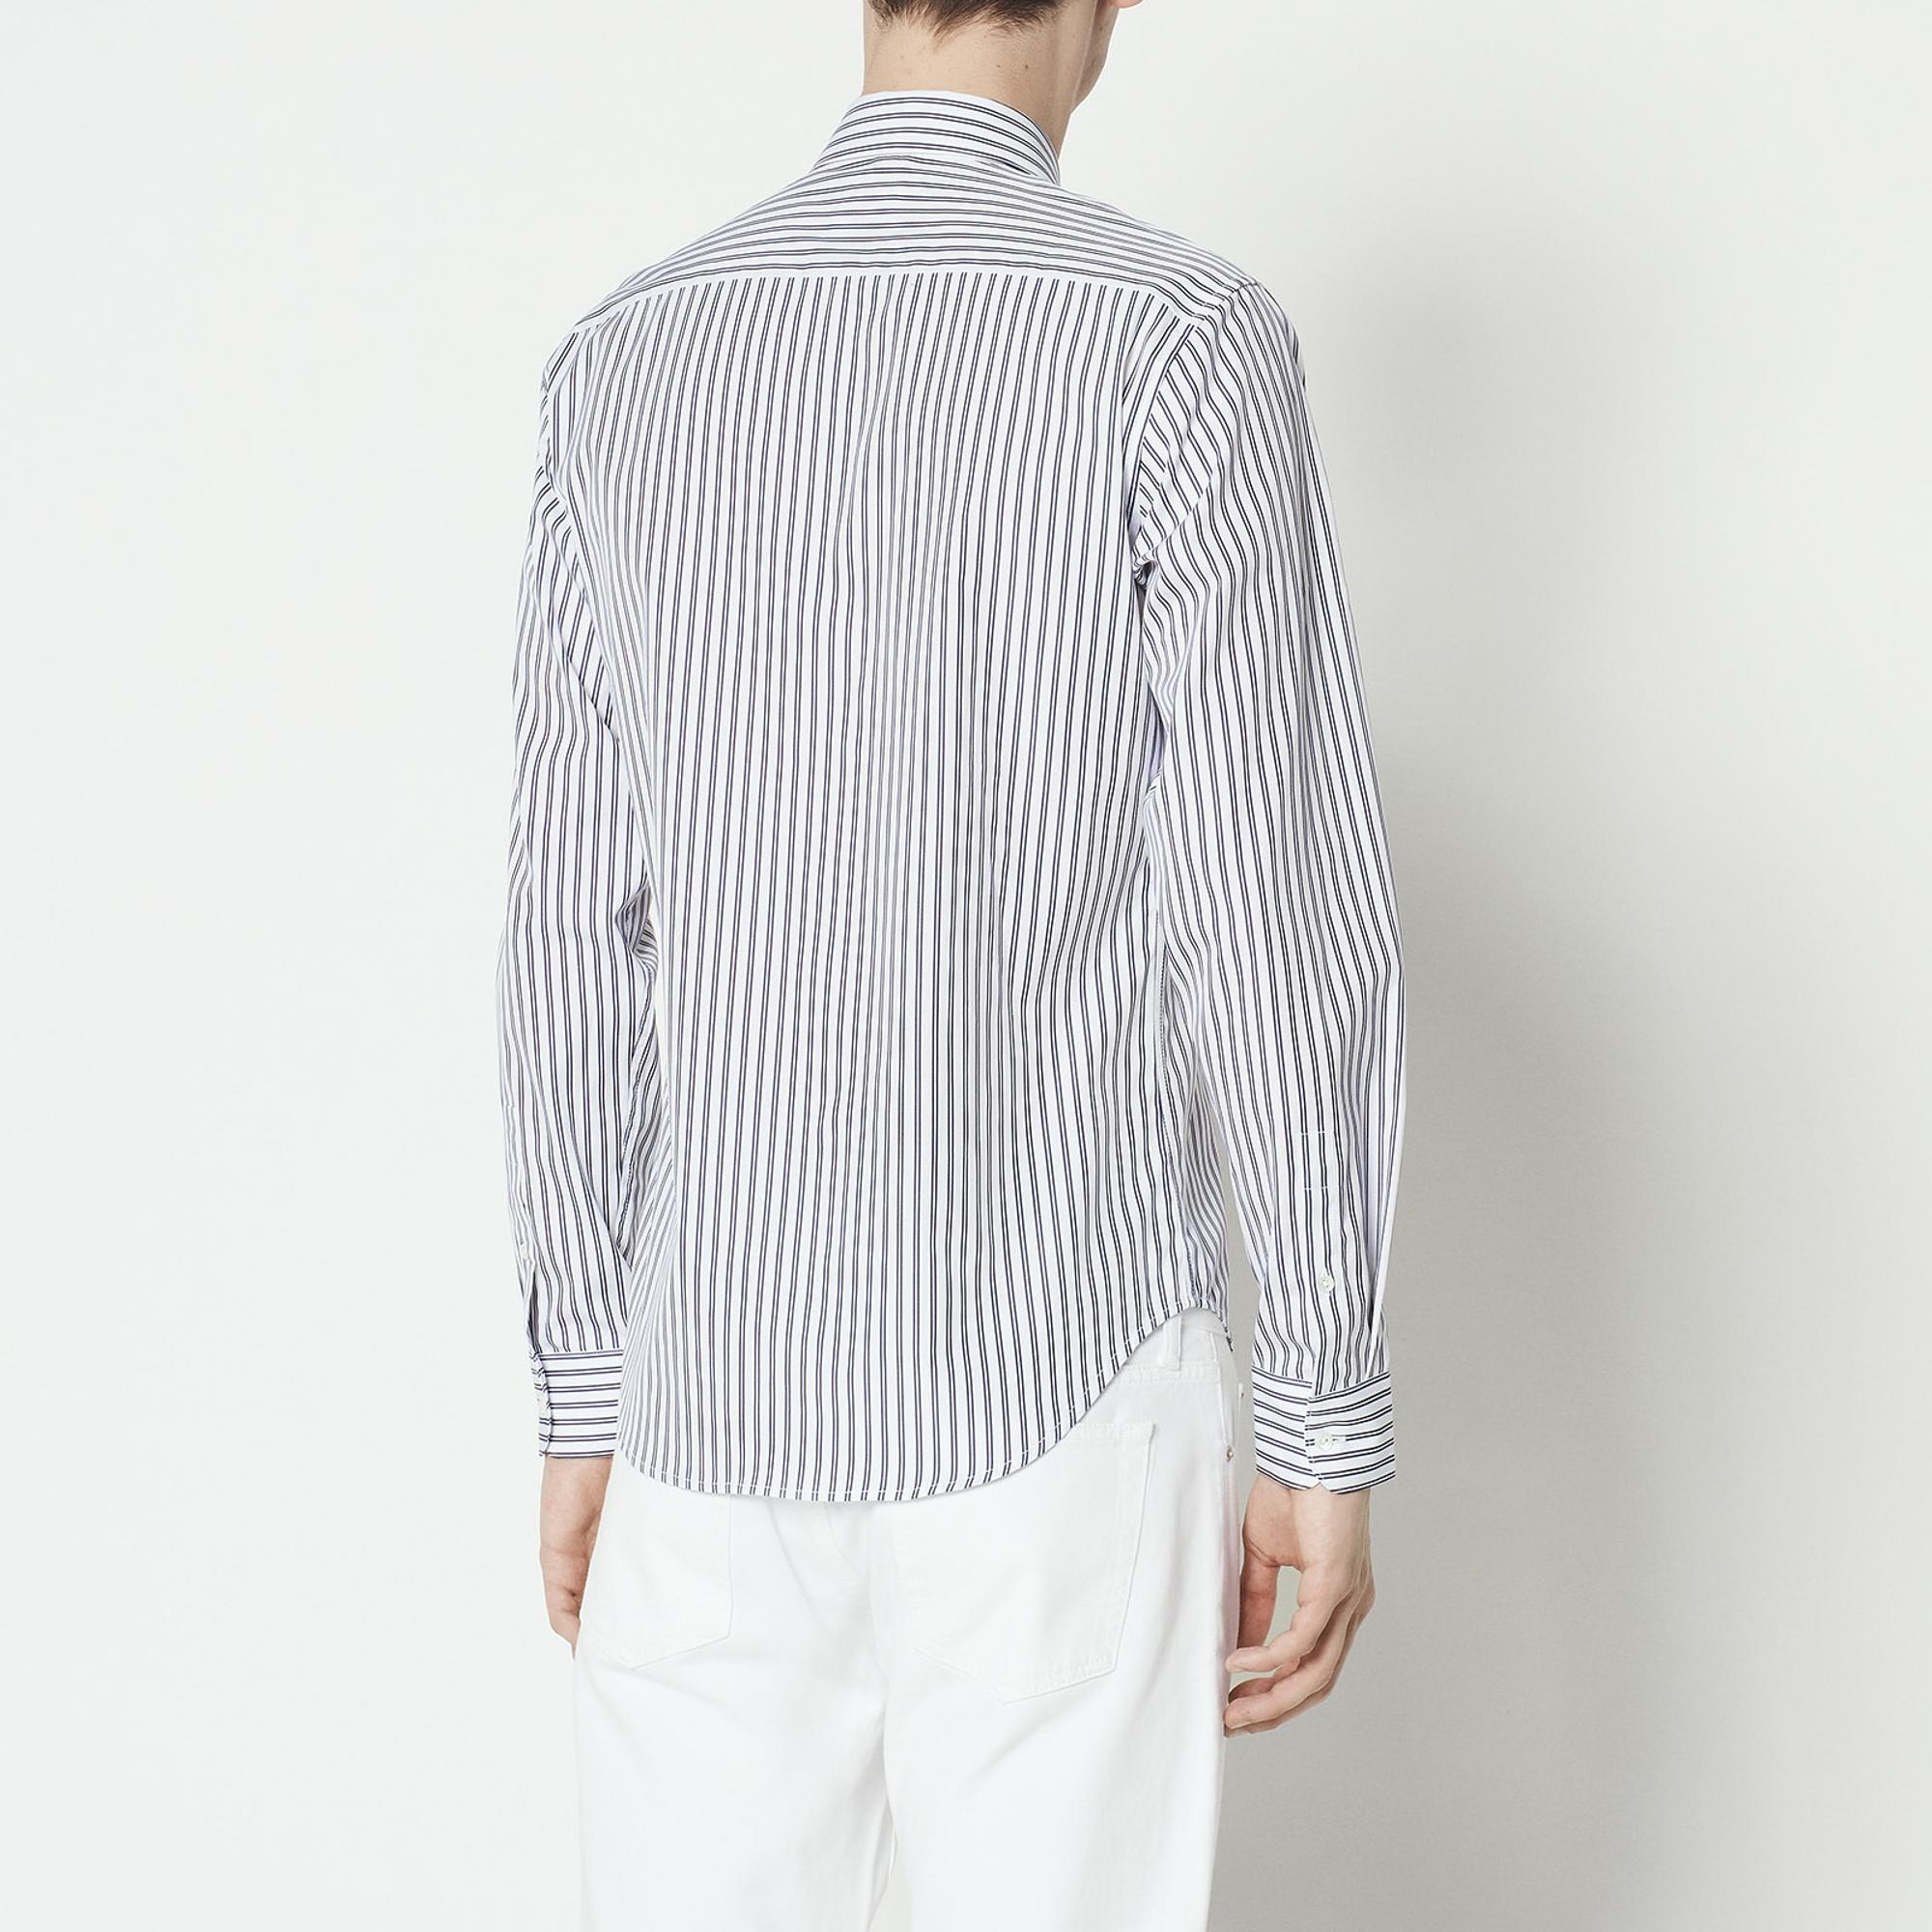 Camicia a maniche lunghe a righe : Collezione Estiva colore Bianco/Blu